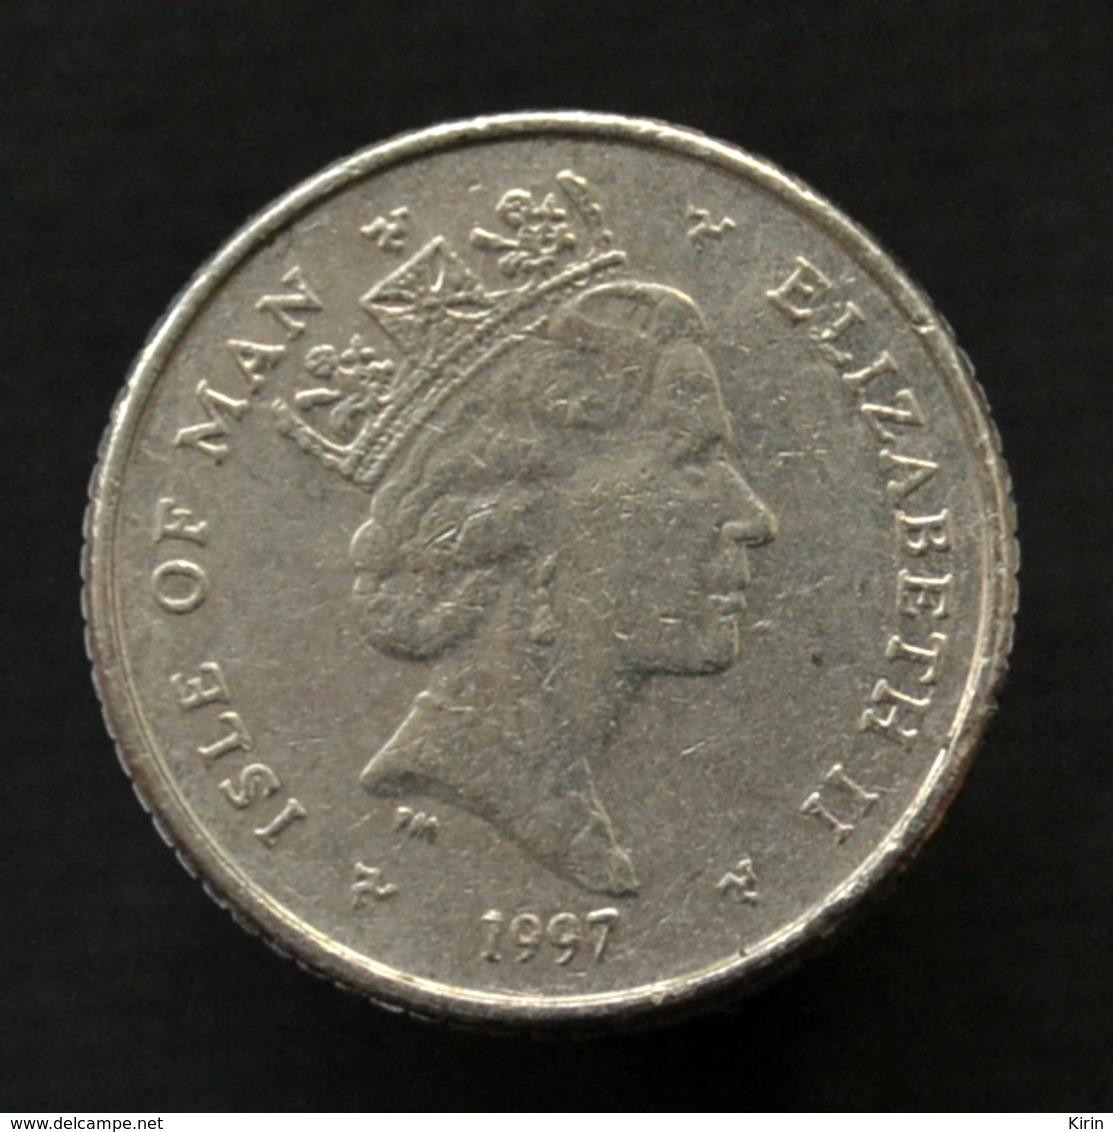 Isle Of Man 5 Pence 1996-97, Km590, Random Age. Coin Golf - Münzen